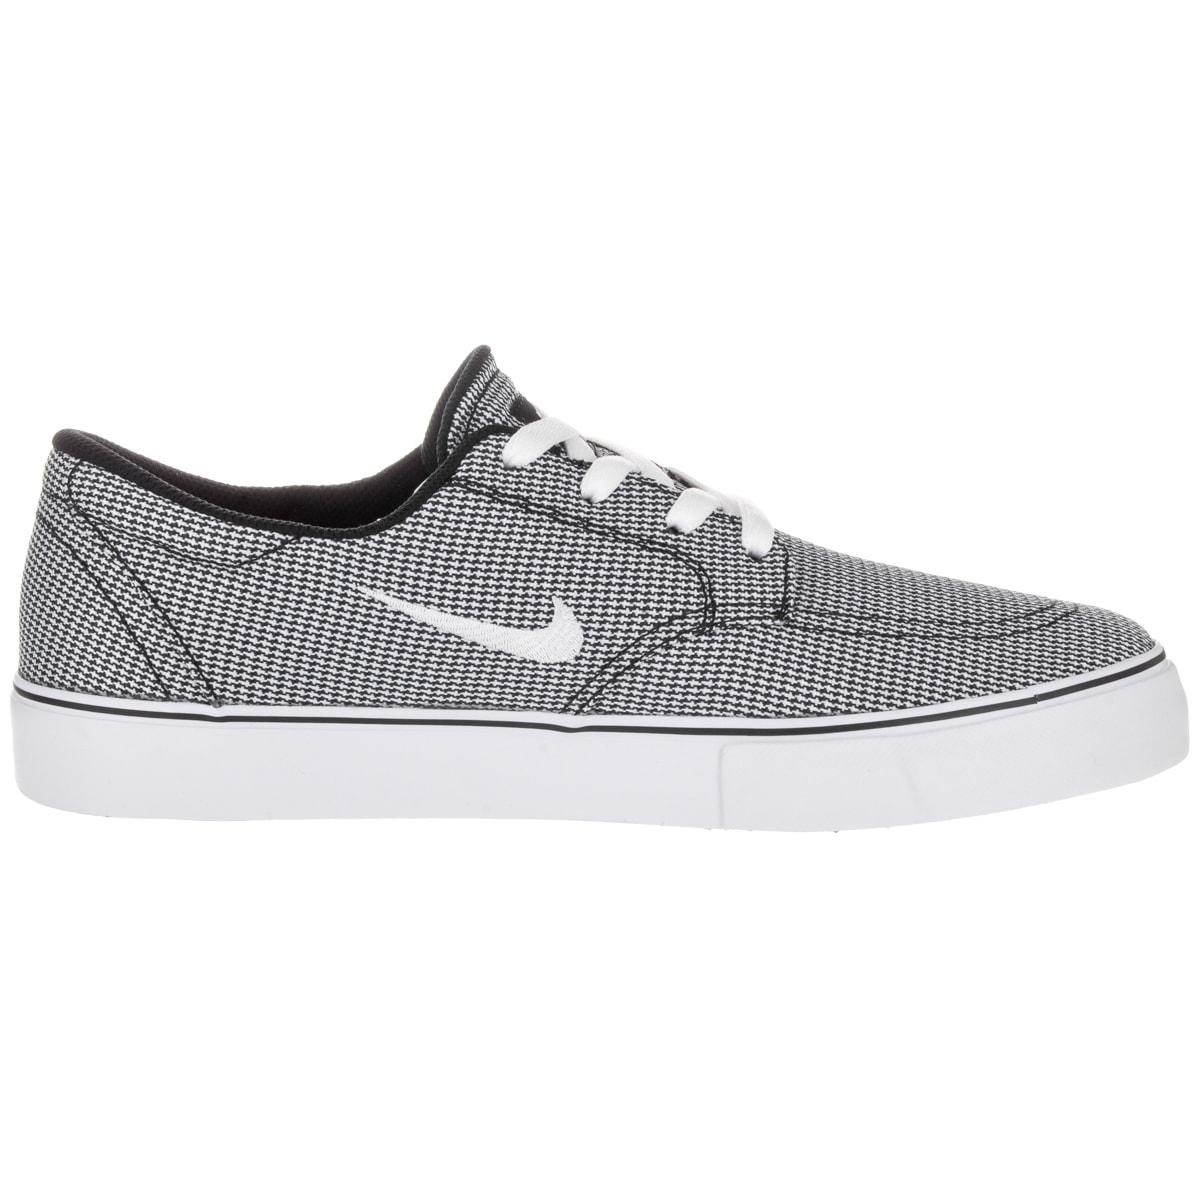 58a09cecc09f Shop Nike Men s Sb Clutch Premium Black White Gum Light Brown Skate Shoe -  Free Shipping Today - Overstock - 12329294